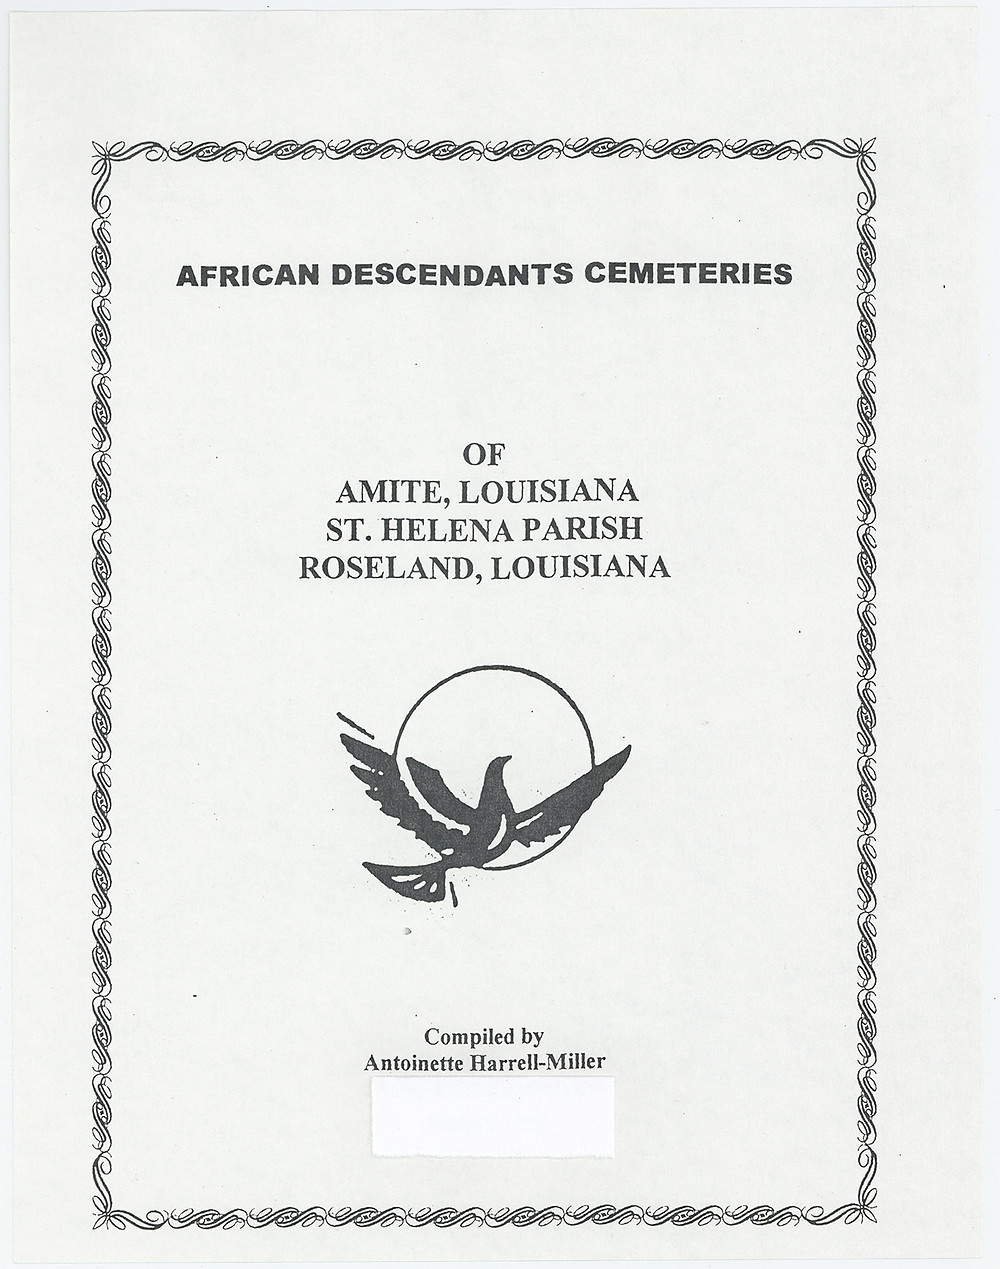 Front cover of 'African Descendants Cemeteries of Amite, Louisiana, St. Helena Parish, Roseland, Louisiana' 2002